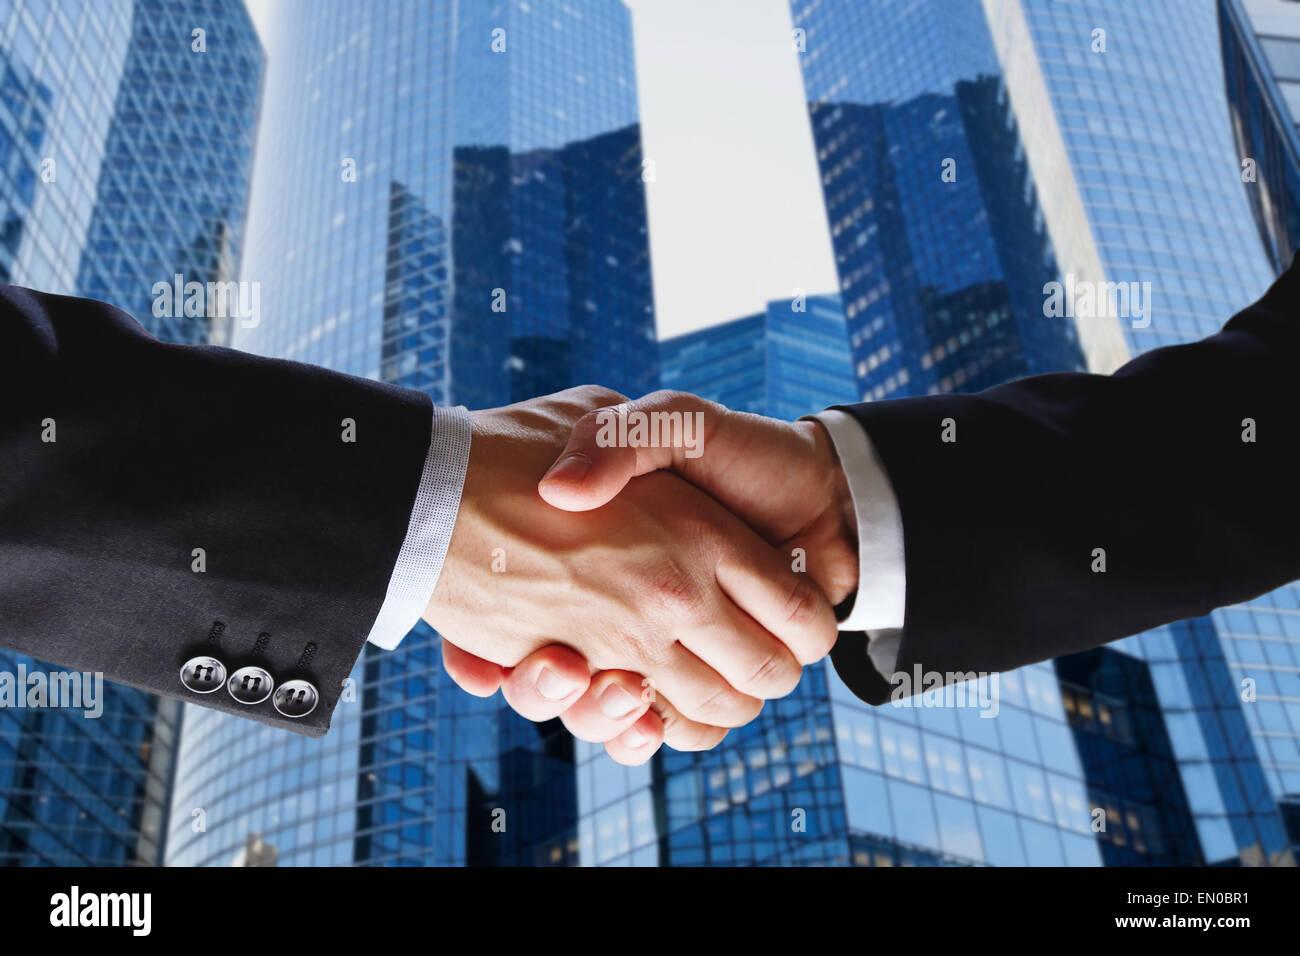 Transaction commerciale, handshake sur fond bleu moderne Photo Stock